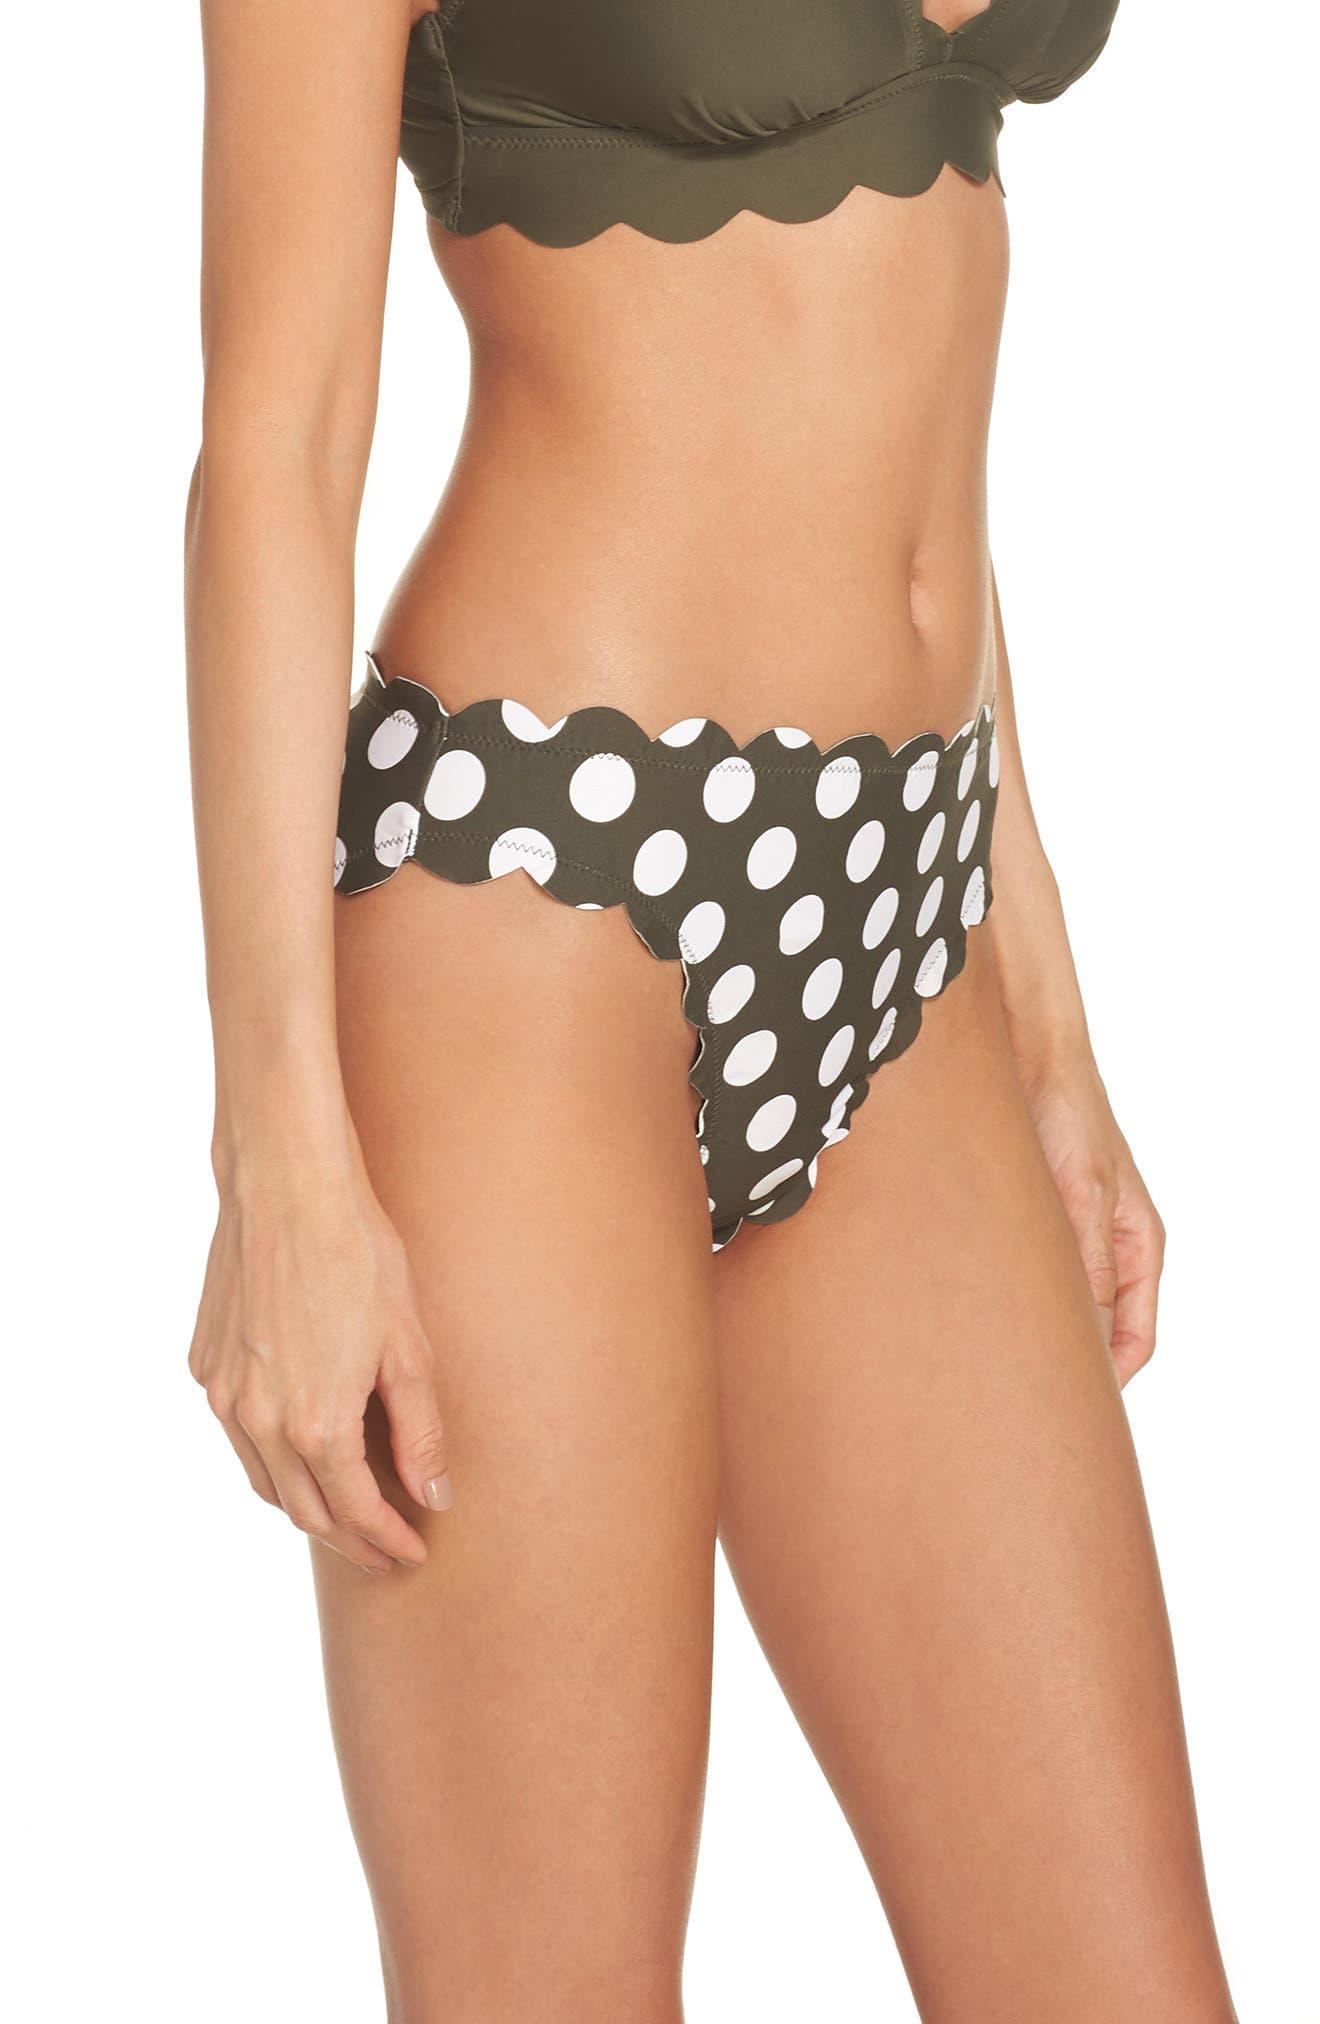 Scallop Hipster Bikini Bottoms,                             Alternate thumbnail 3, color,                             OLIVE SARMA/ IVORY EGRET DOT